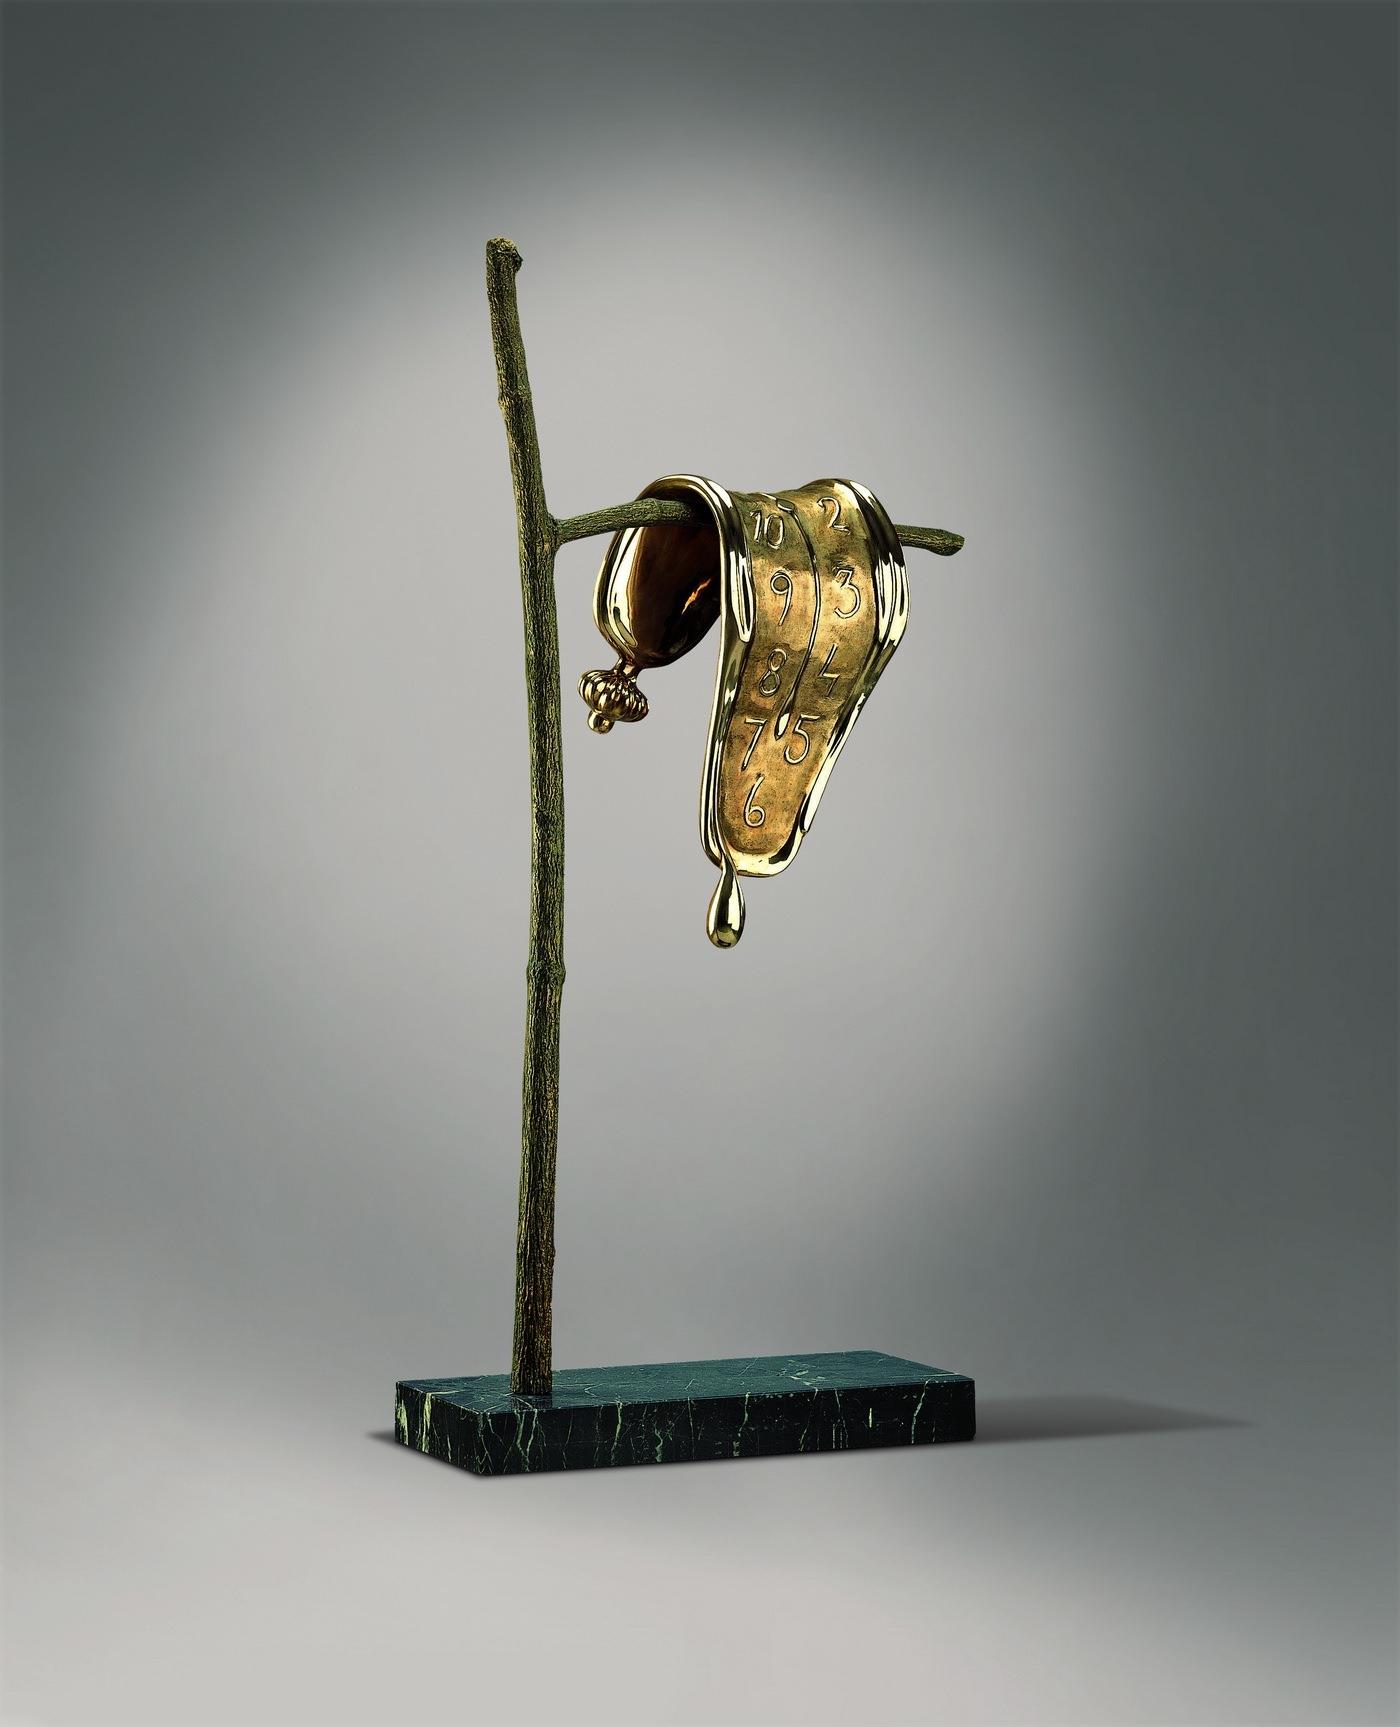 Постоянство памяти © I.A.R. Art Resources Ltd. Высота скульптуры 191 см